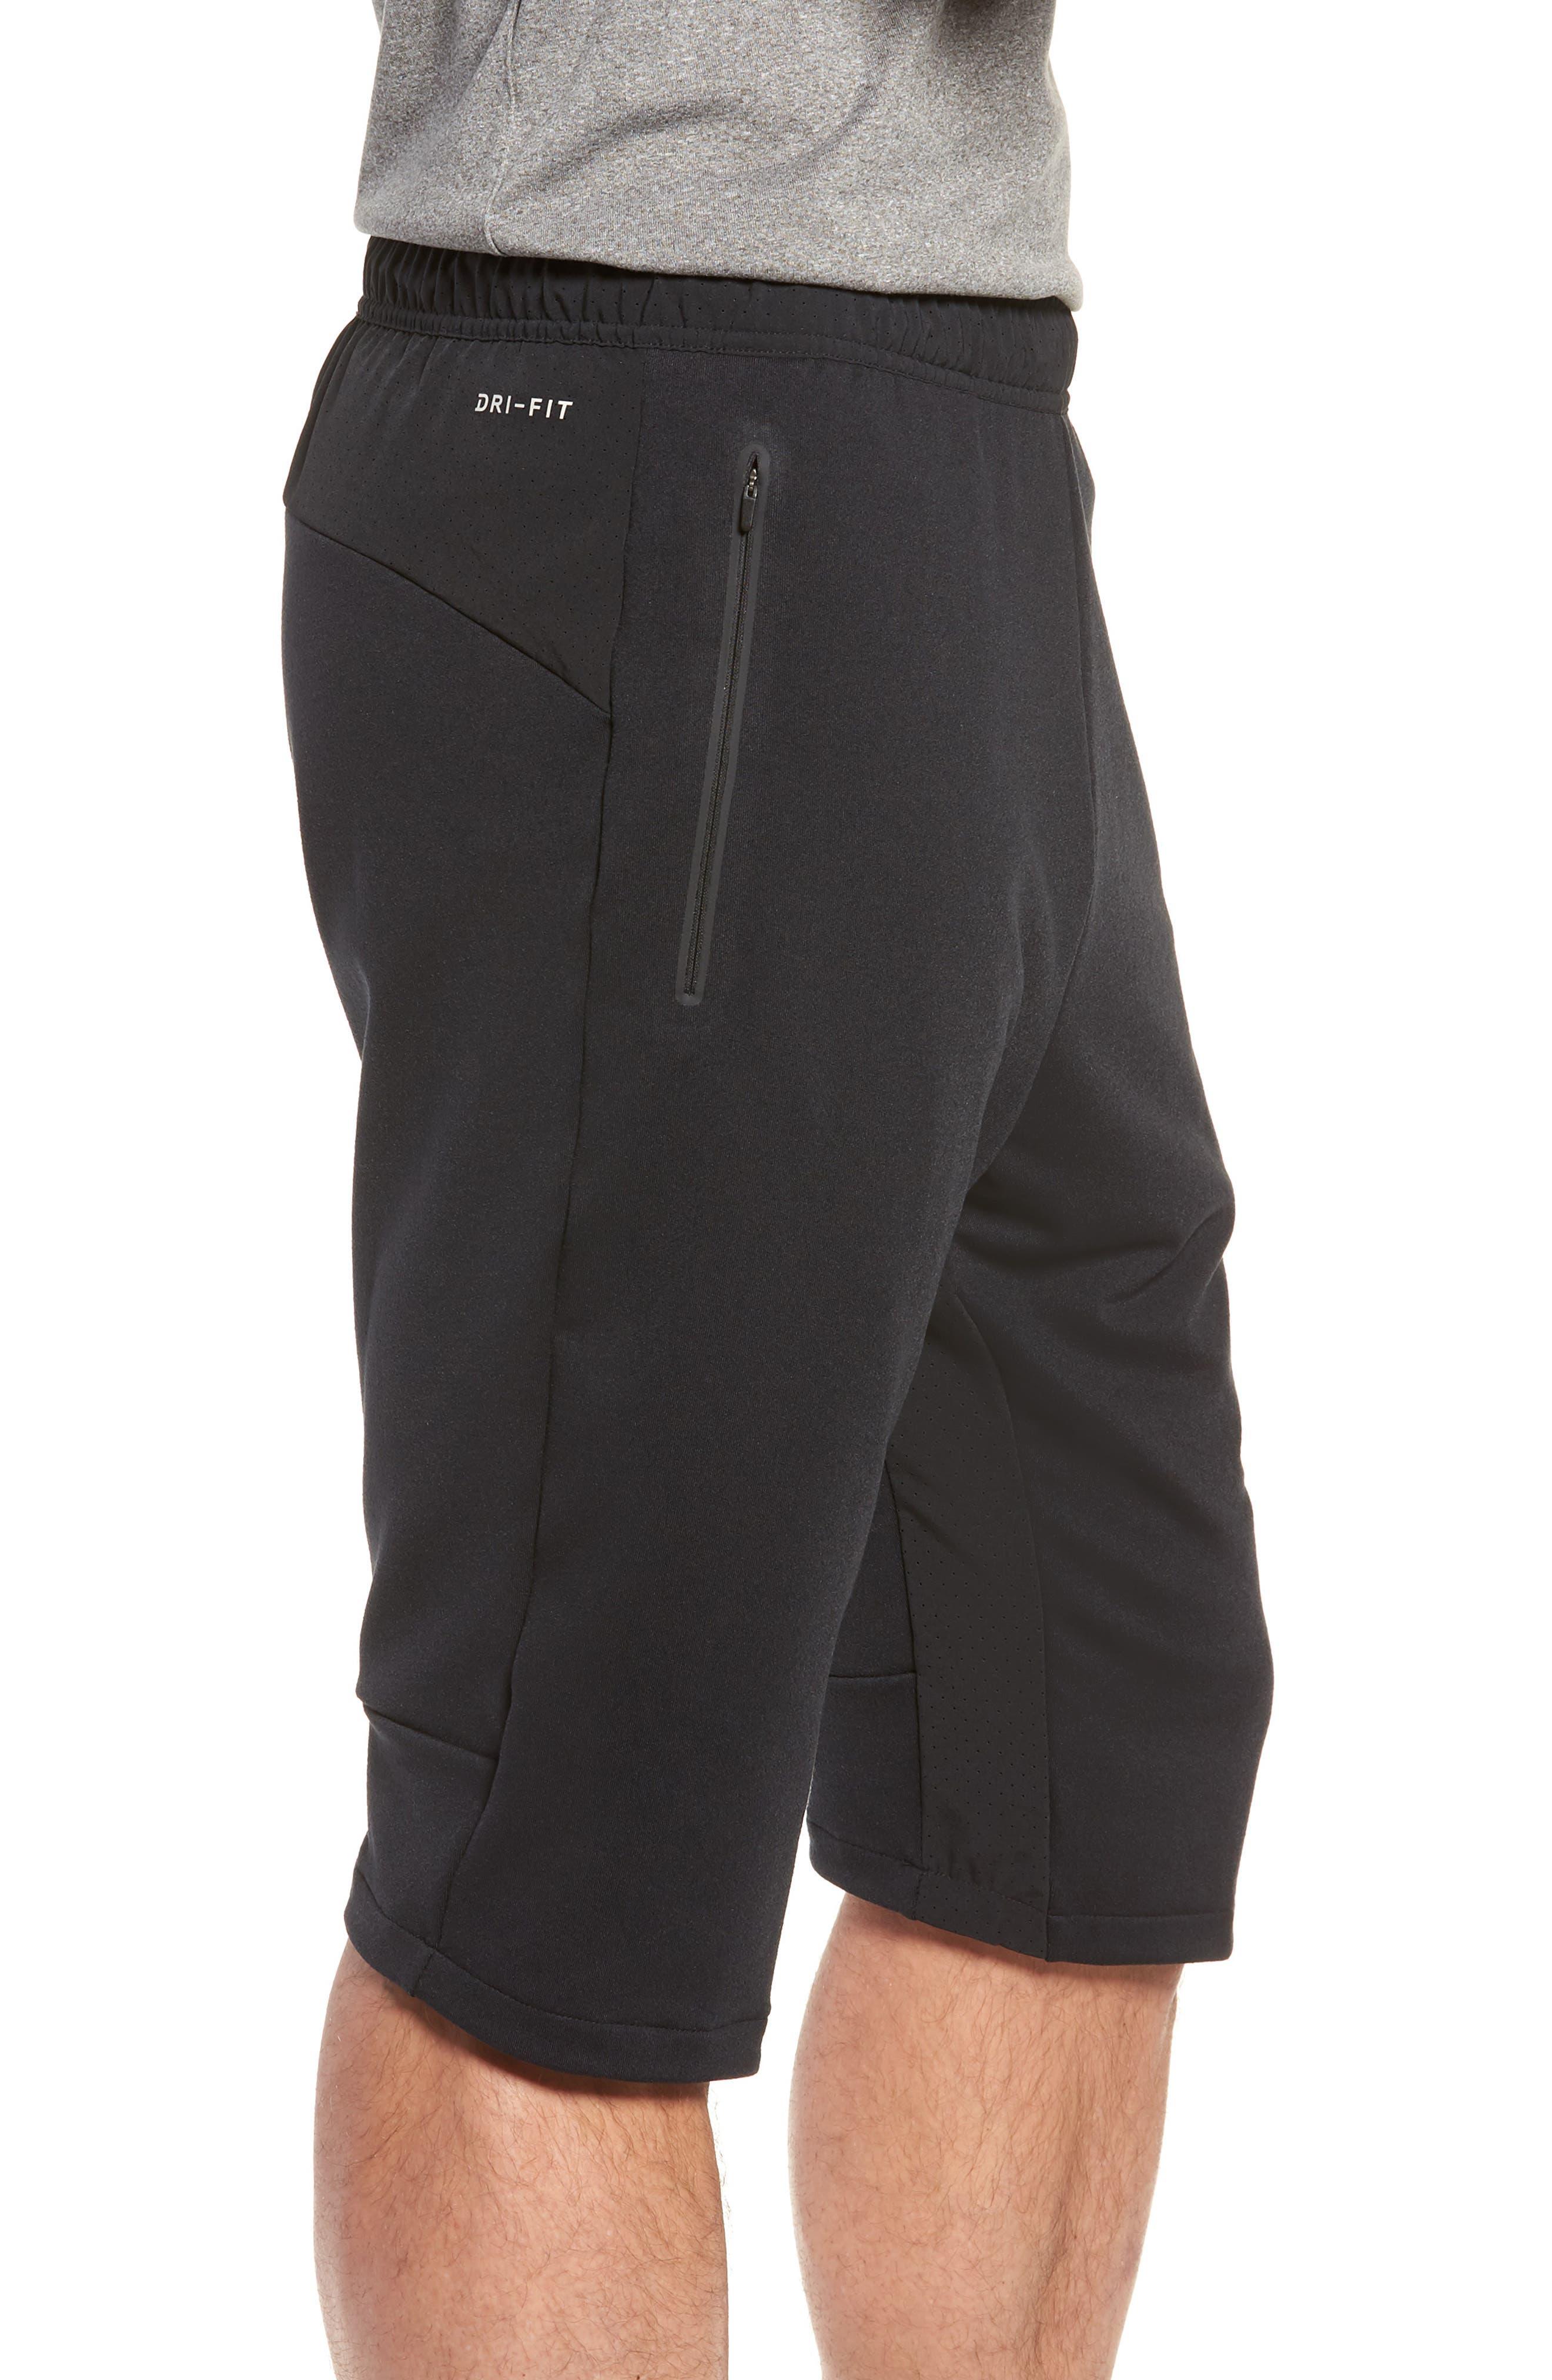 Dry Max Training Shorts,                             Alternate thumbnail 3, color,                             010